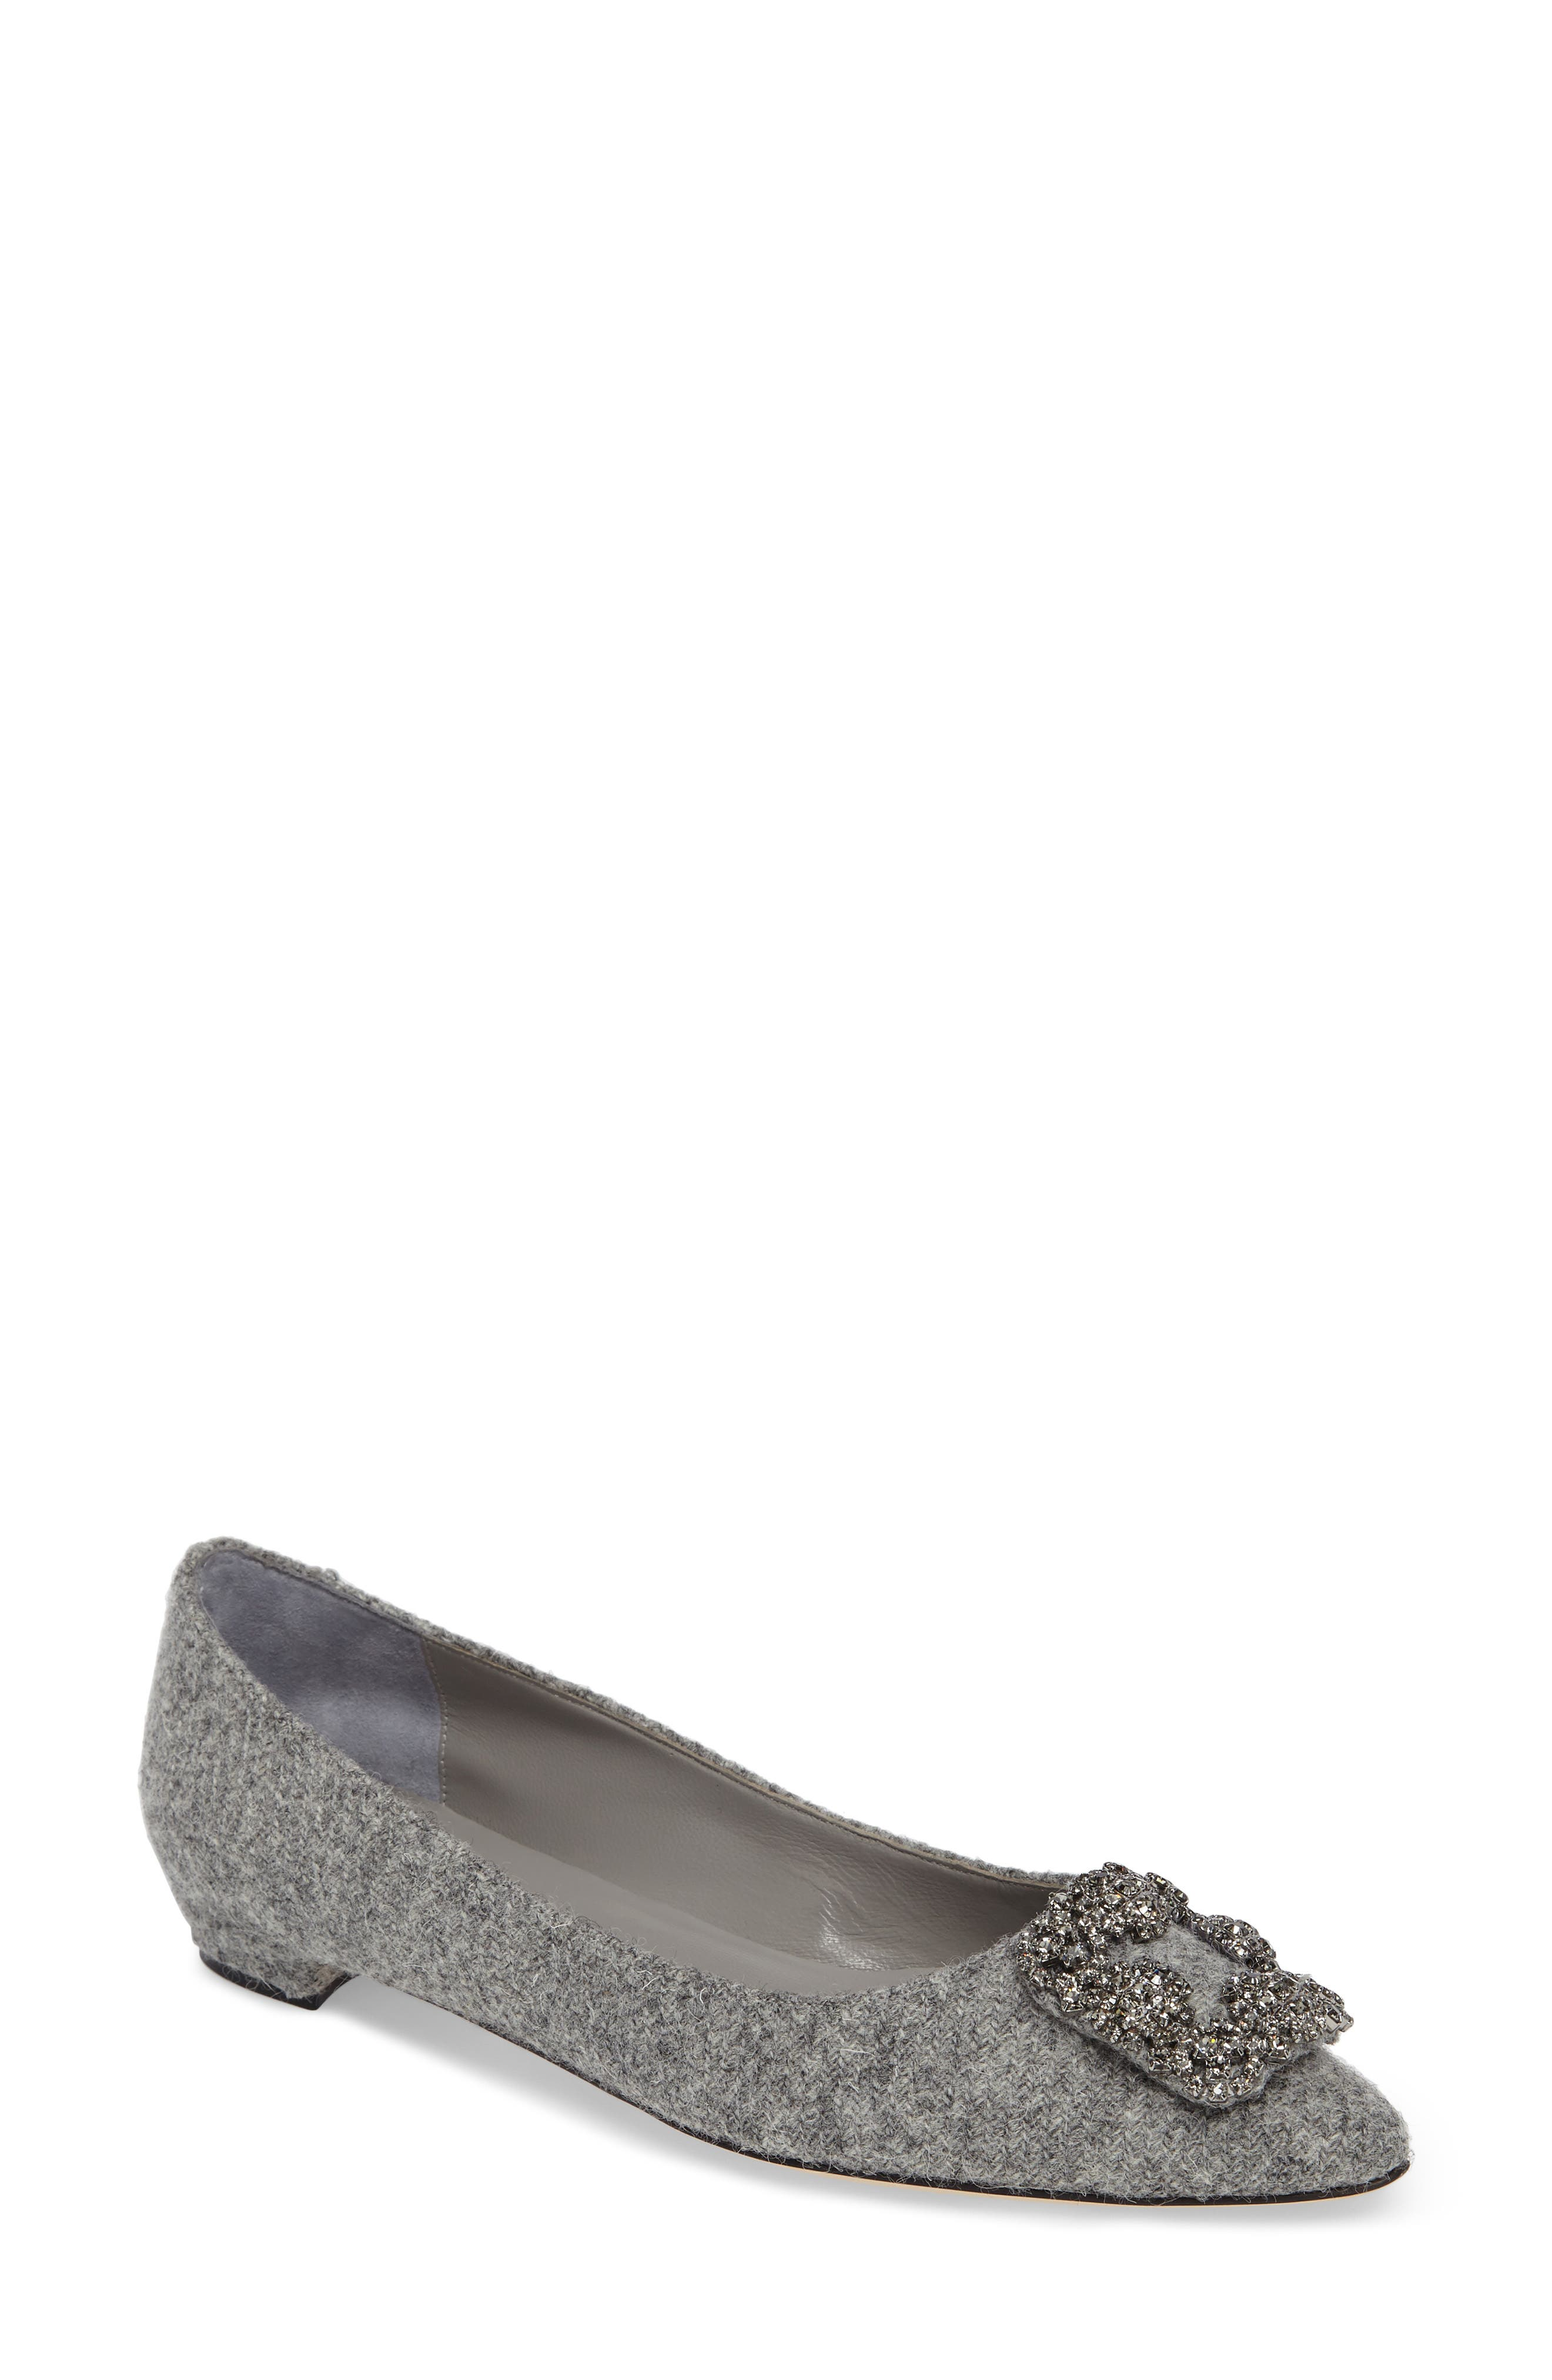 Alternate Image 1 Selected - Manolo Blahnik 'Hangisi' Jeweled Pointy Toe Flat (Women)